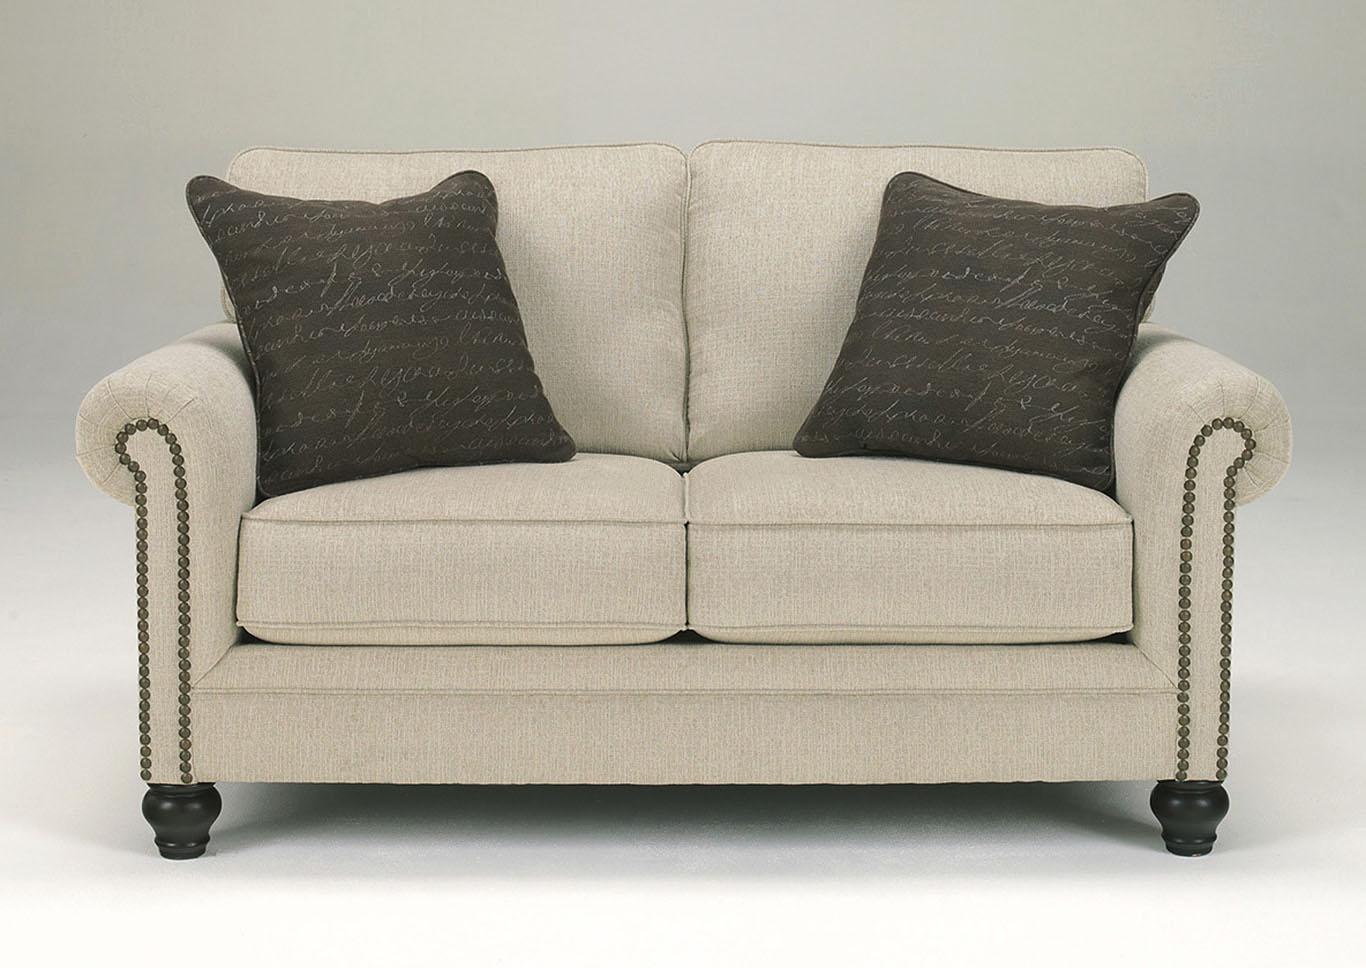 jennifer convertible sofas on sale white sofa covers australia furniture outlet chicago il milari linen loveseat